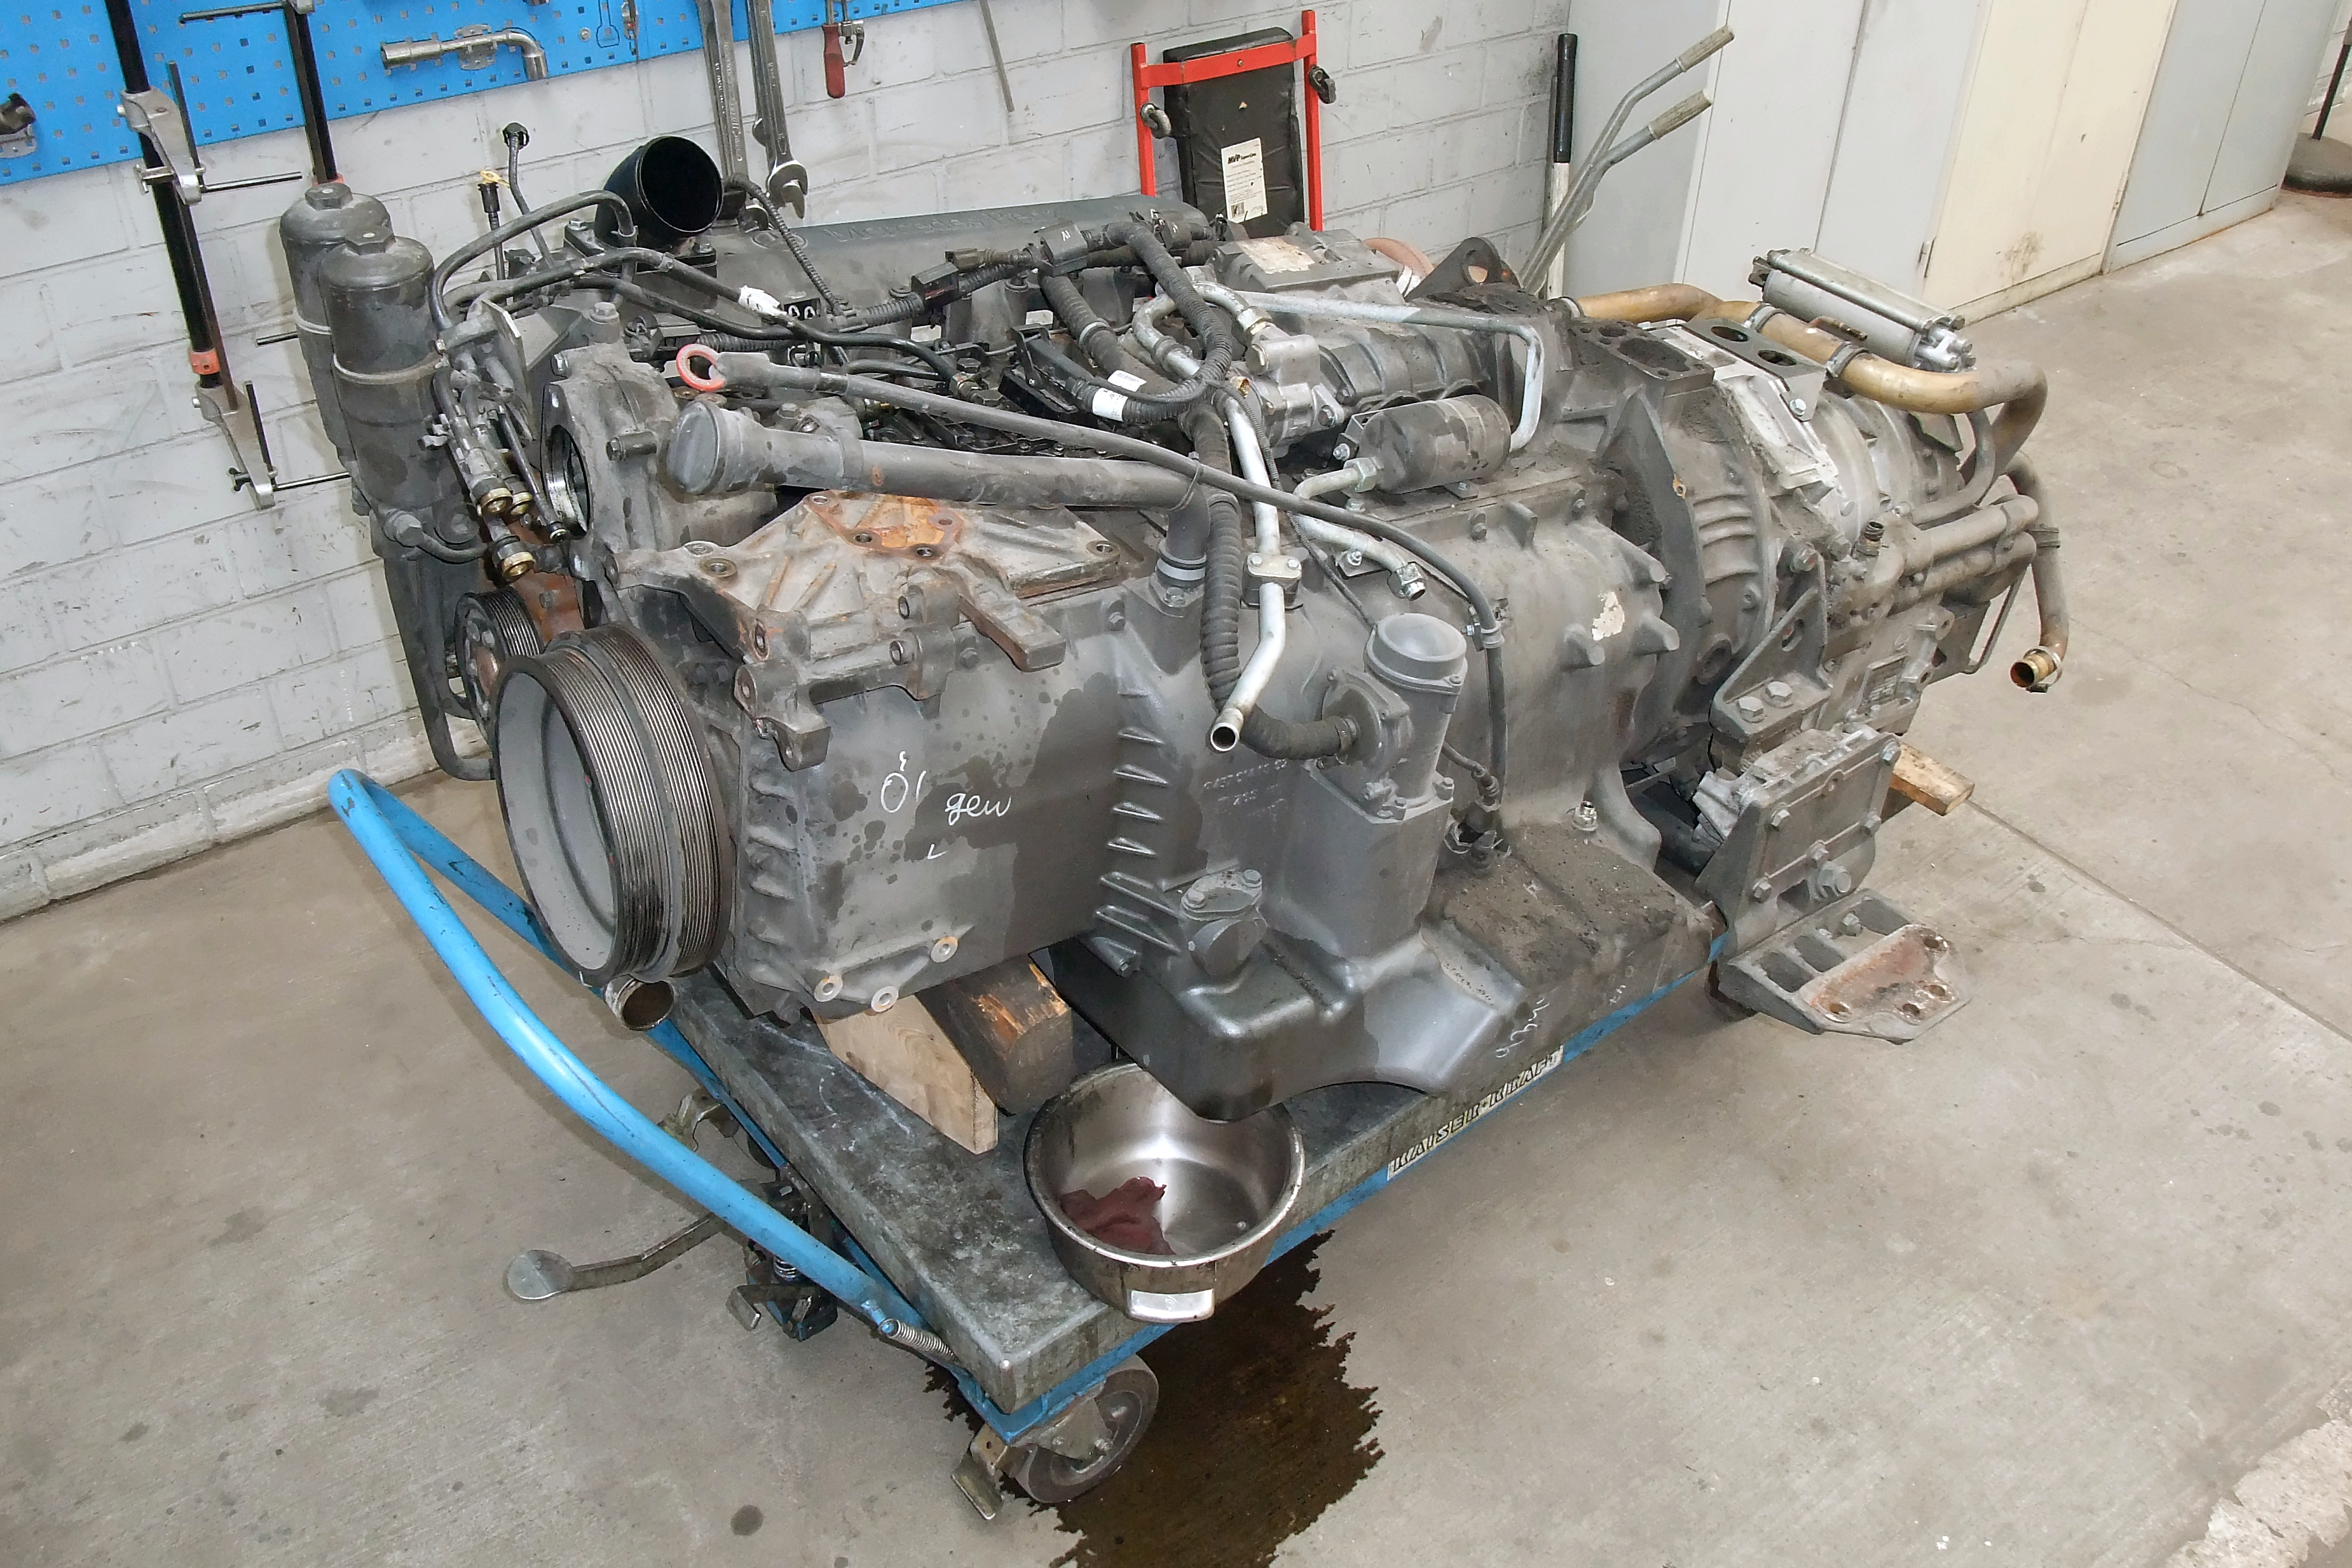 Mercedes-Benz OM457 engine - Wikipedia